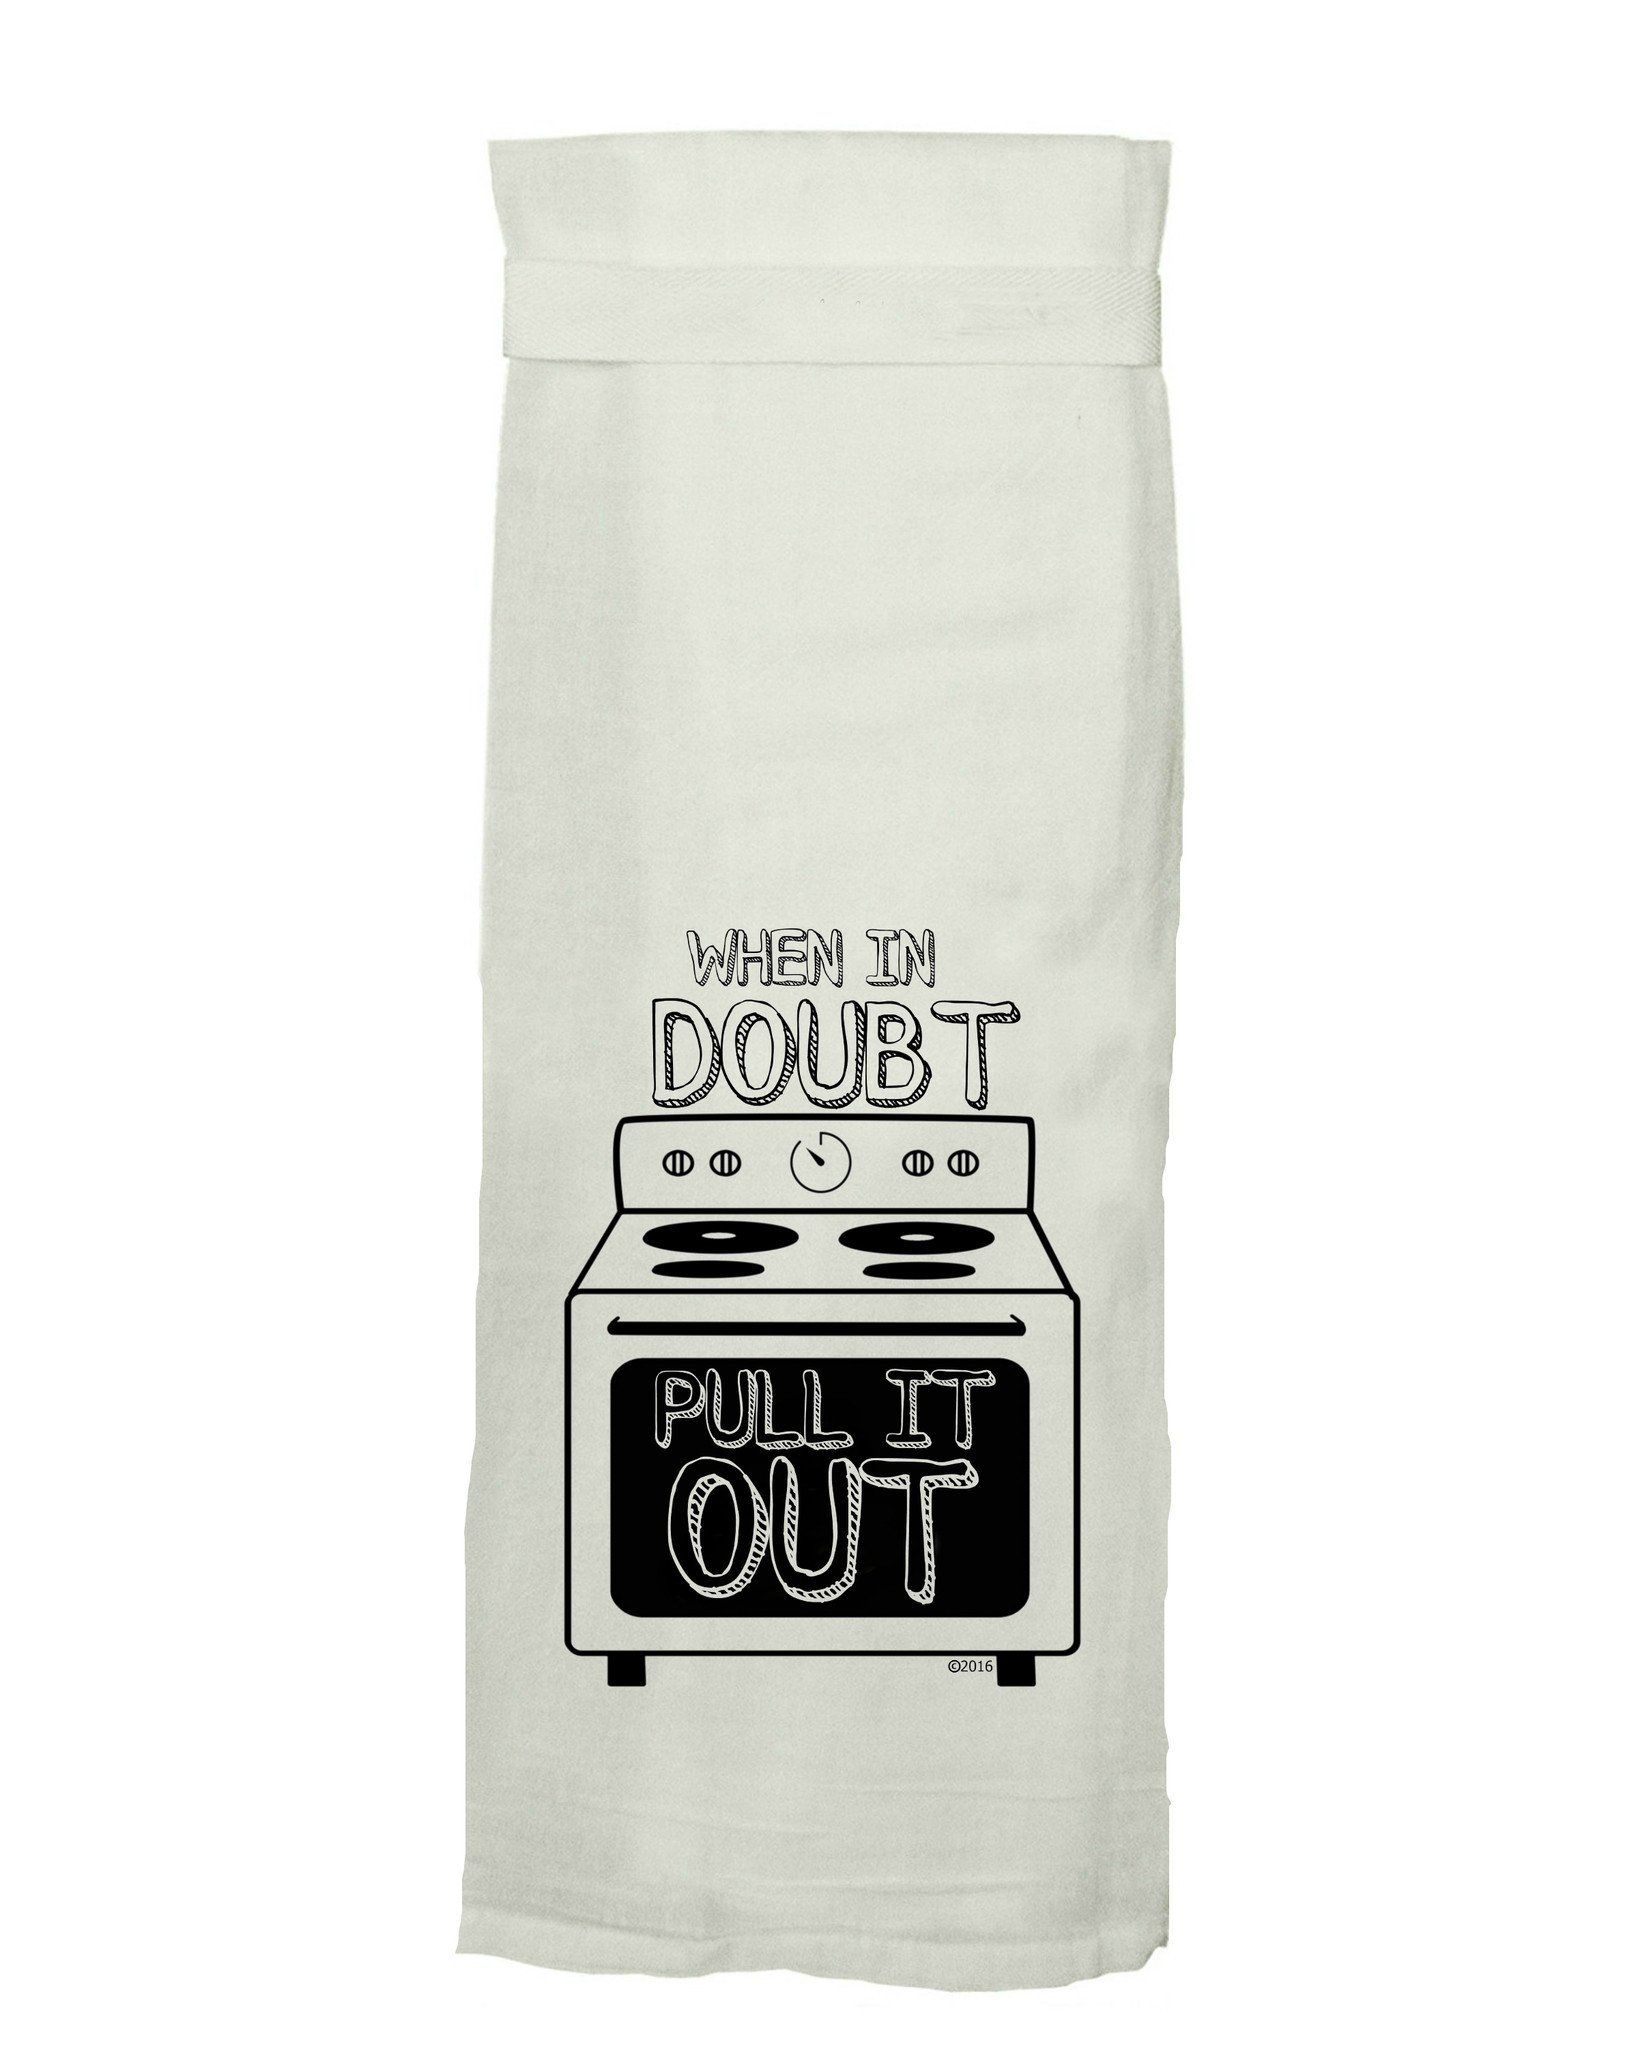 When In Doubt Flour Sack Tea Towel Funny Tea Towels Kitchen Humor Flour Sack Tea Towels